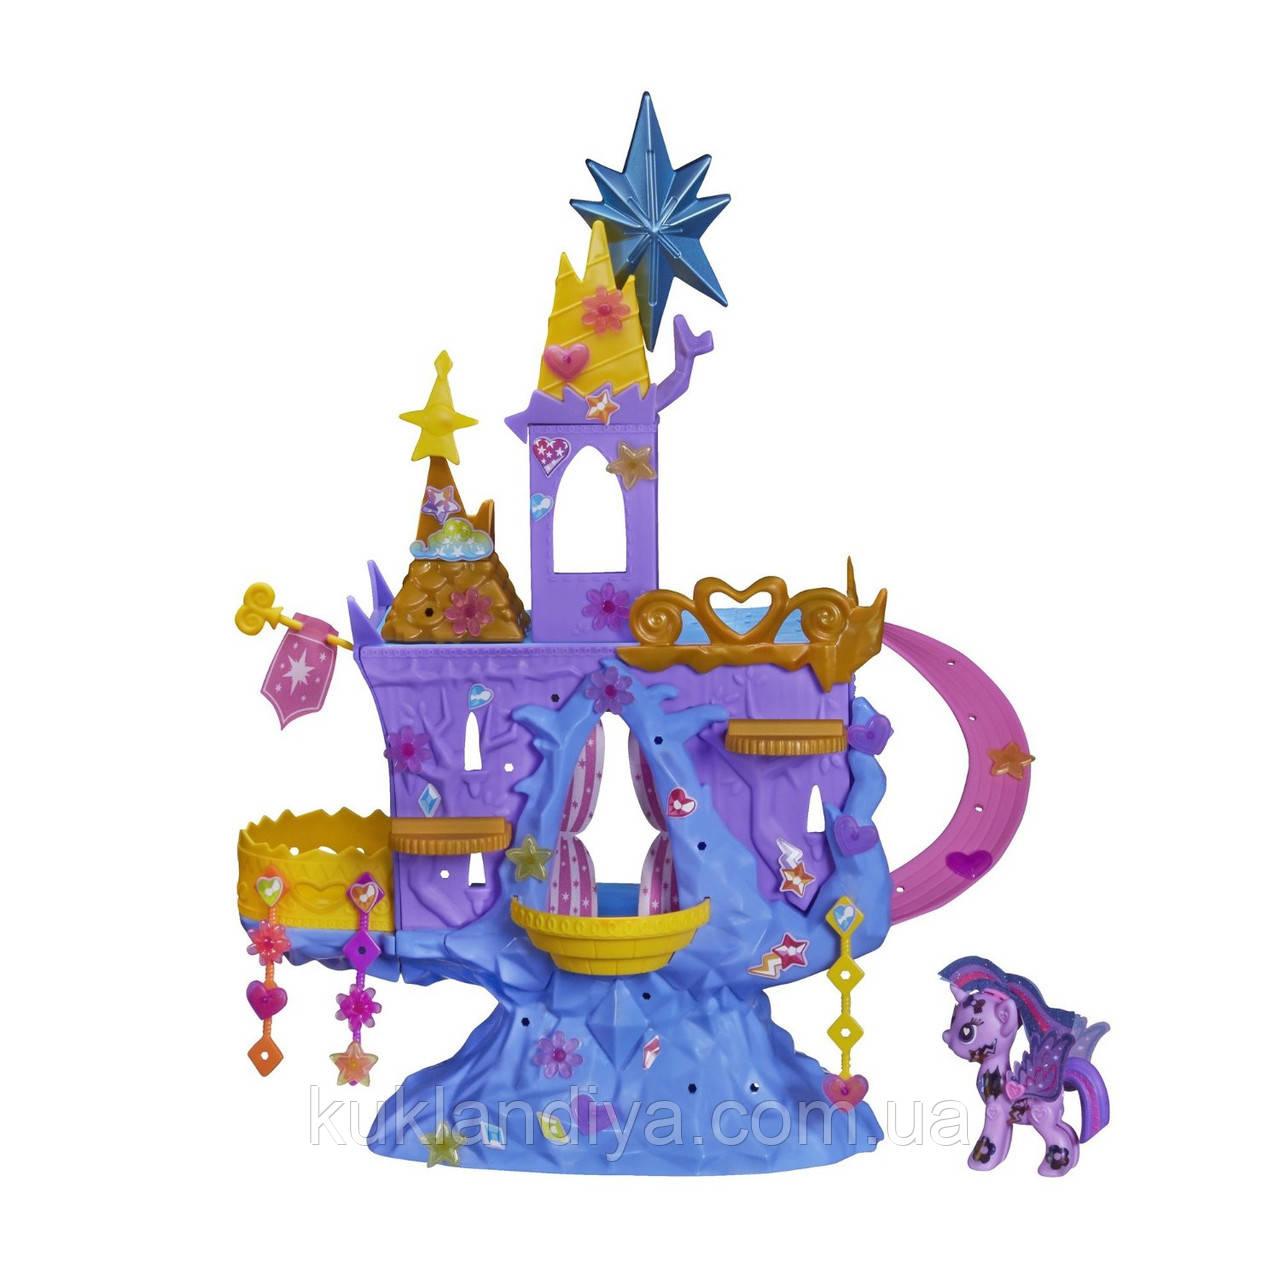 Замок принцессы Твайлайт Спаркл My Little Pony Princess Twilight Sparkle's Kingdom